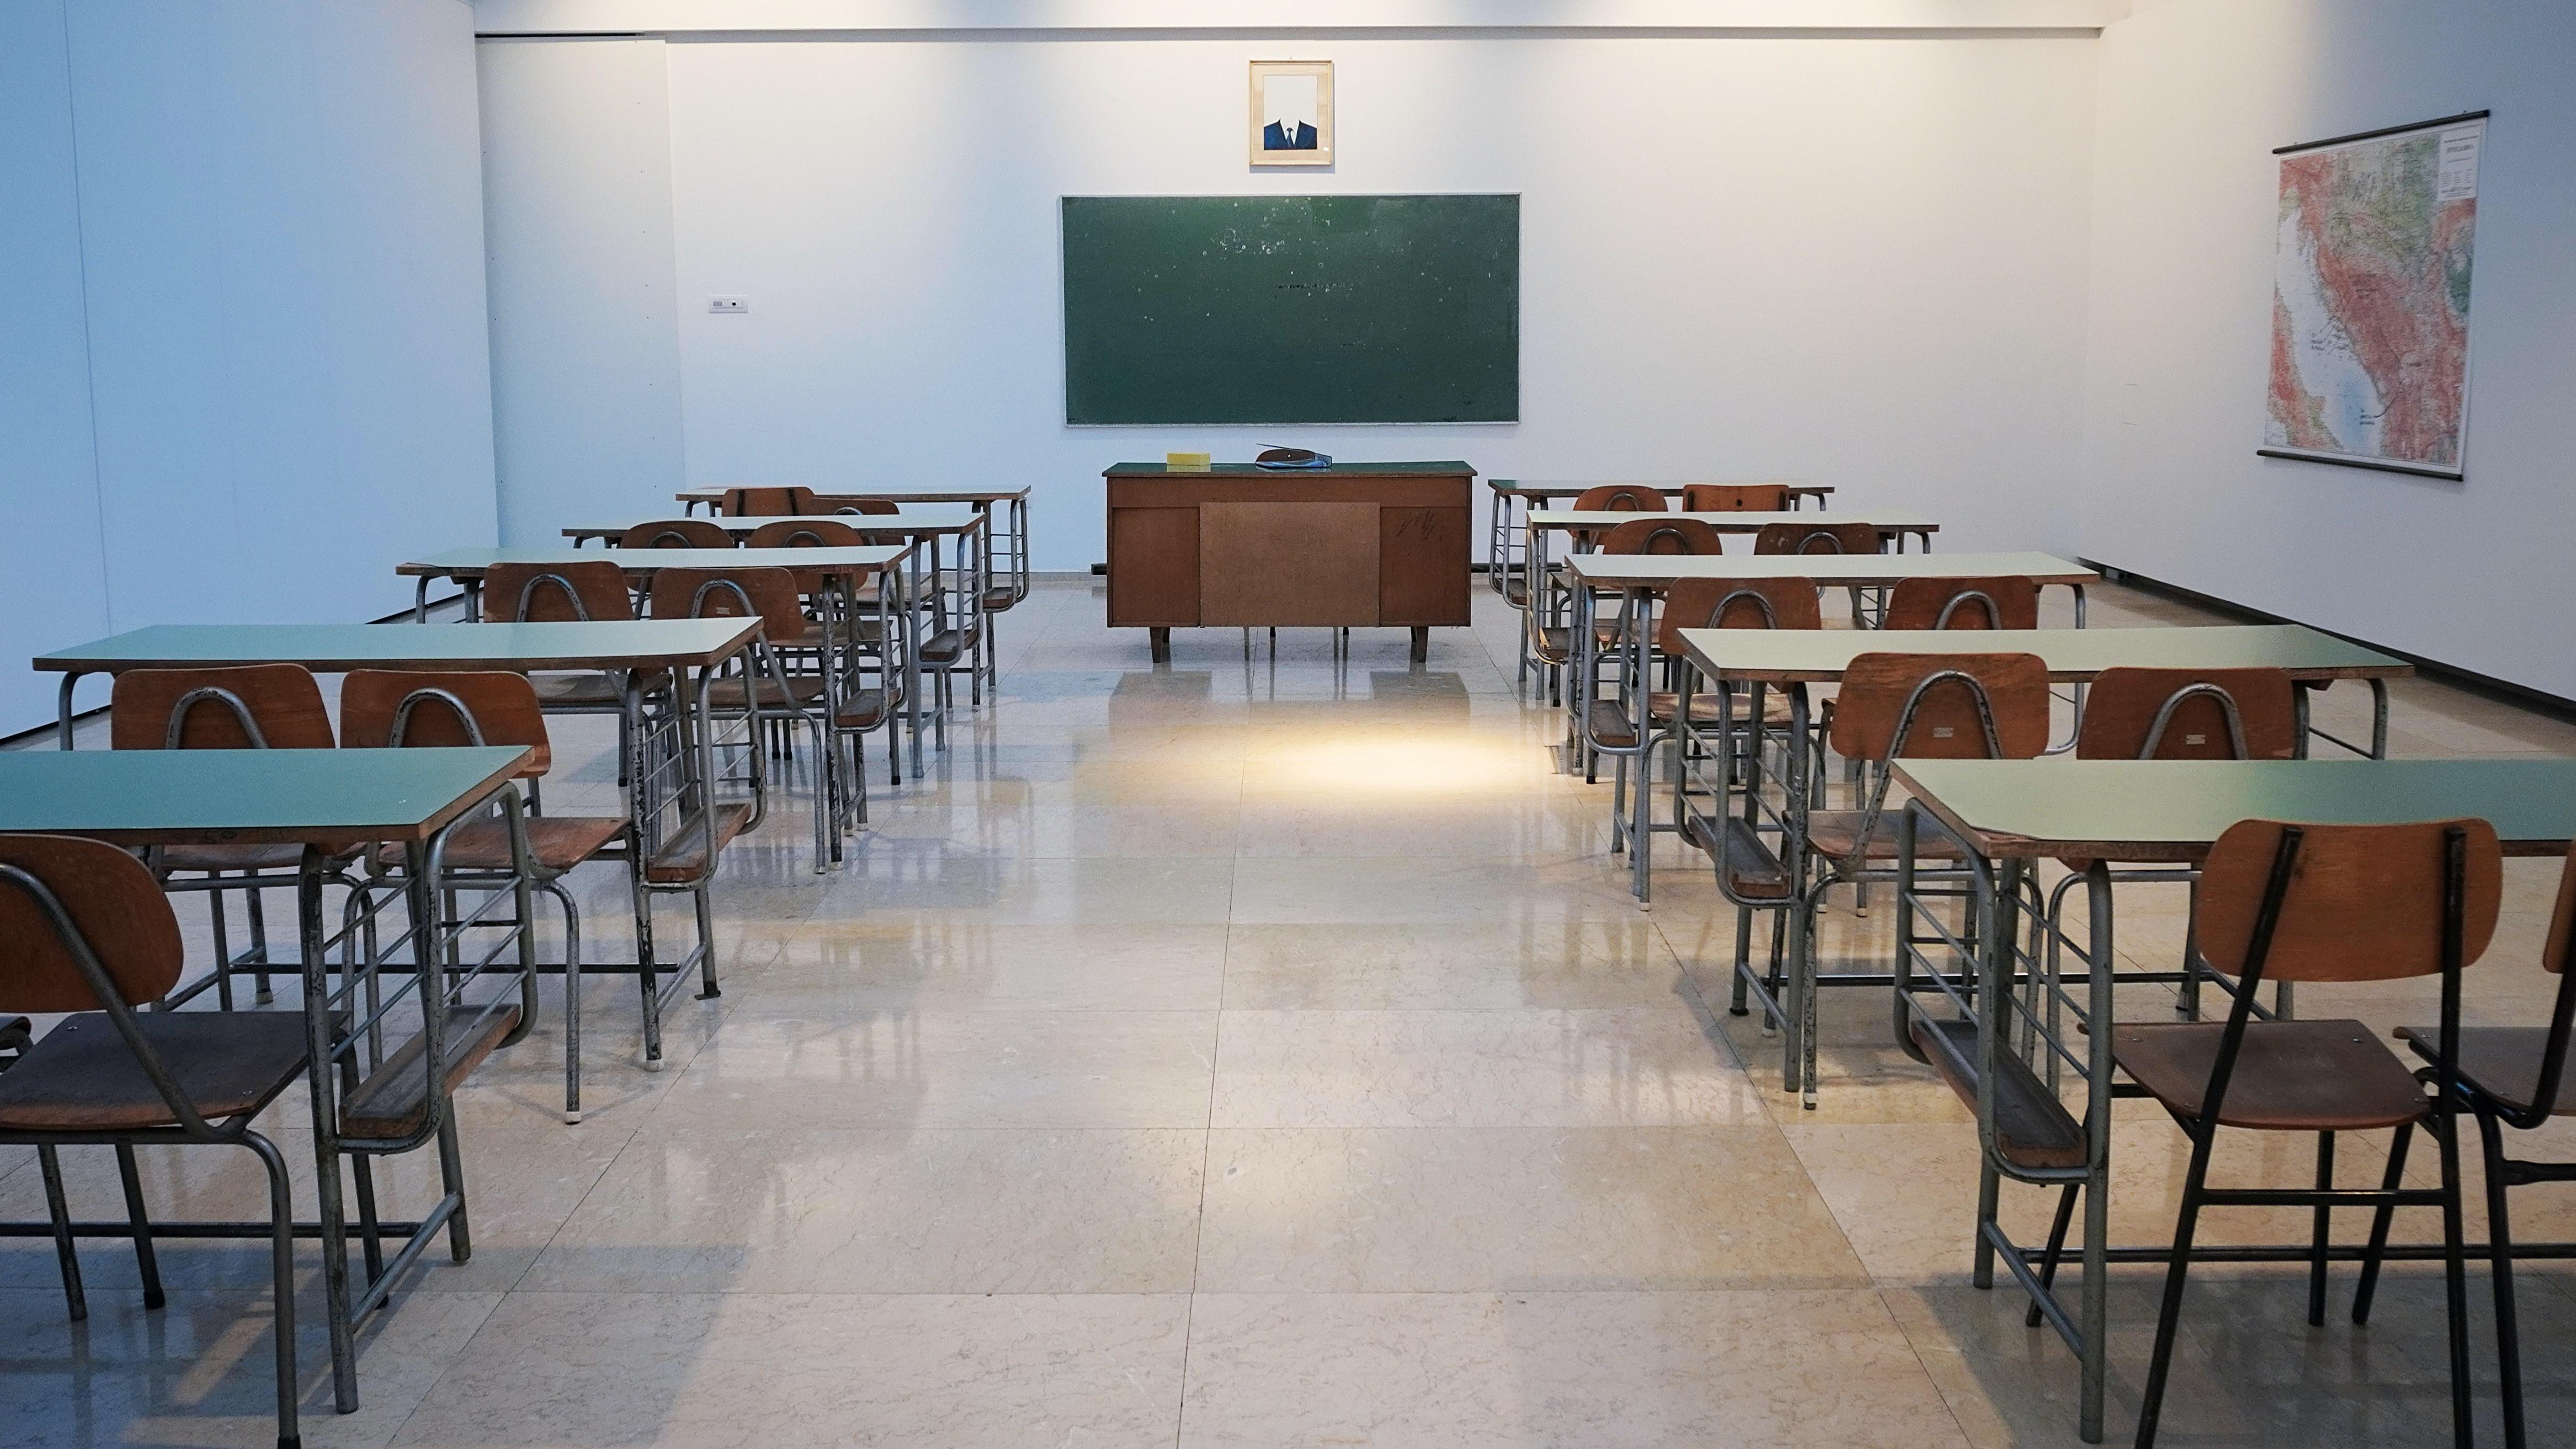 salas-de-clases-en-pandemia-002